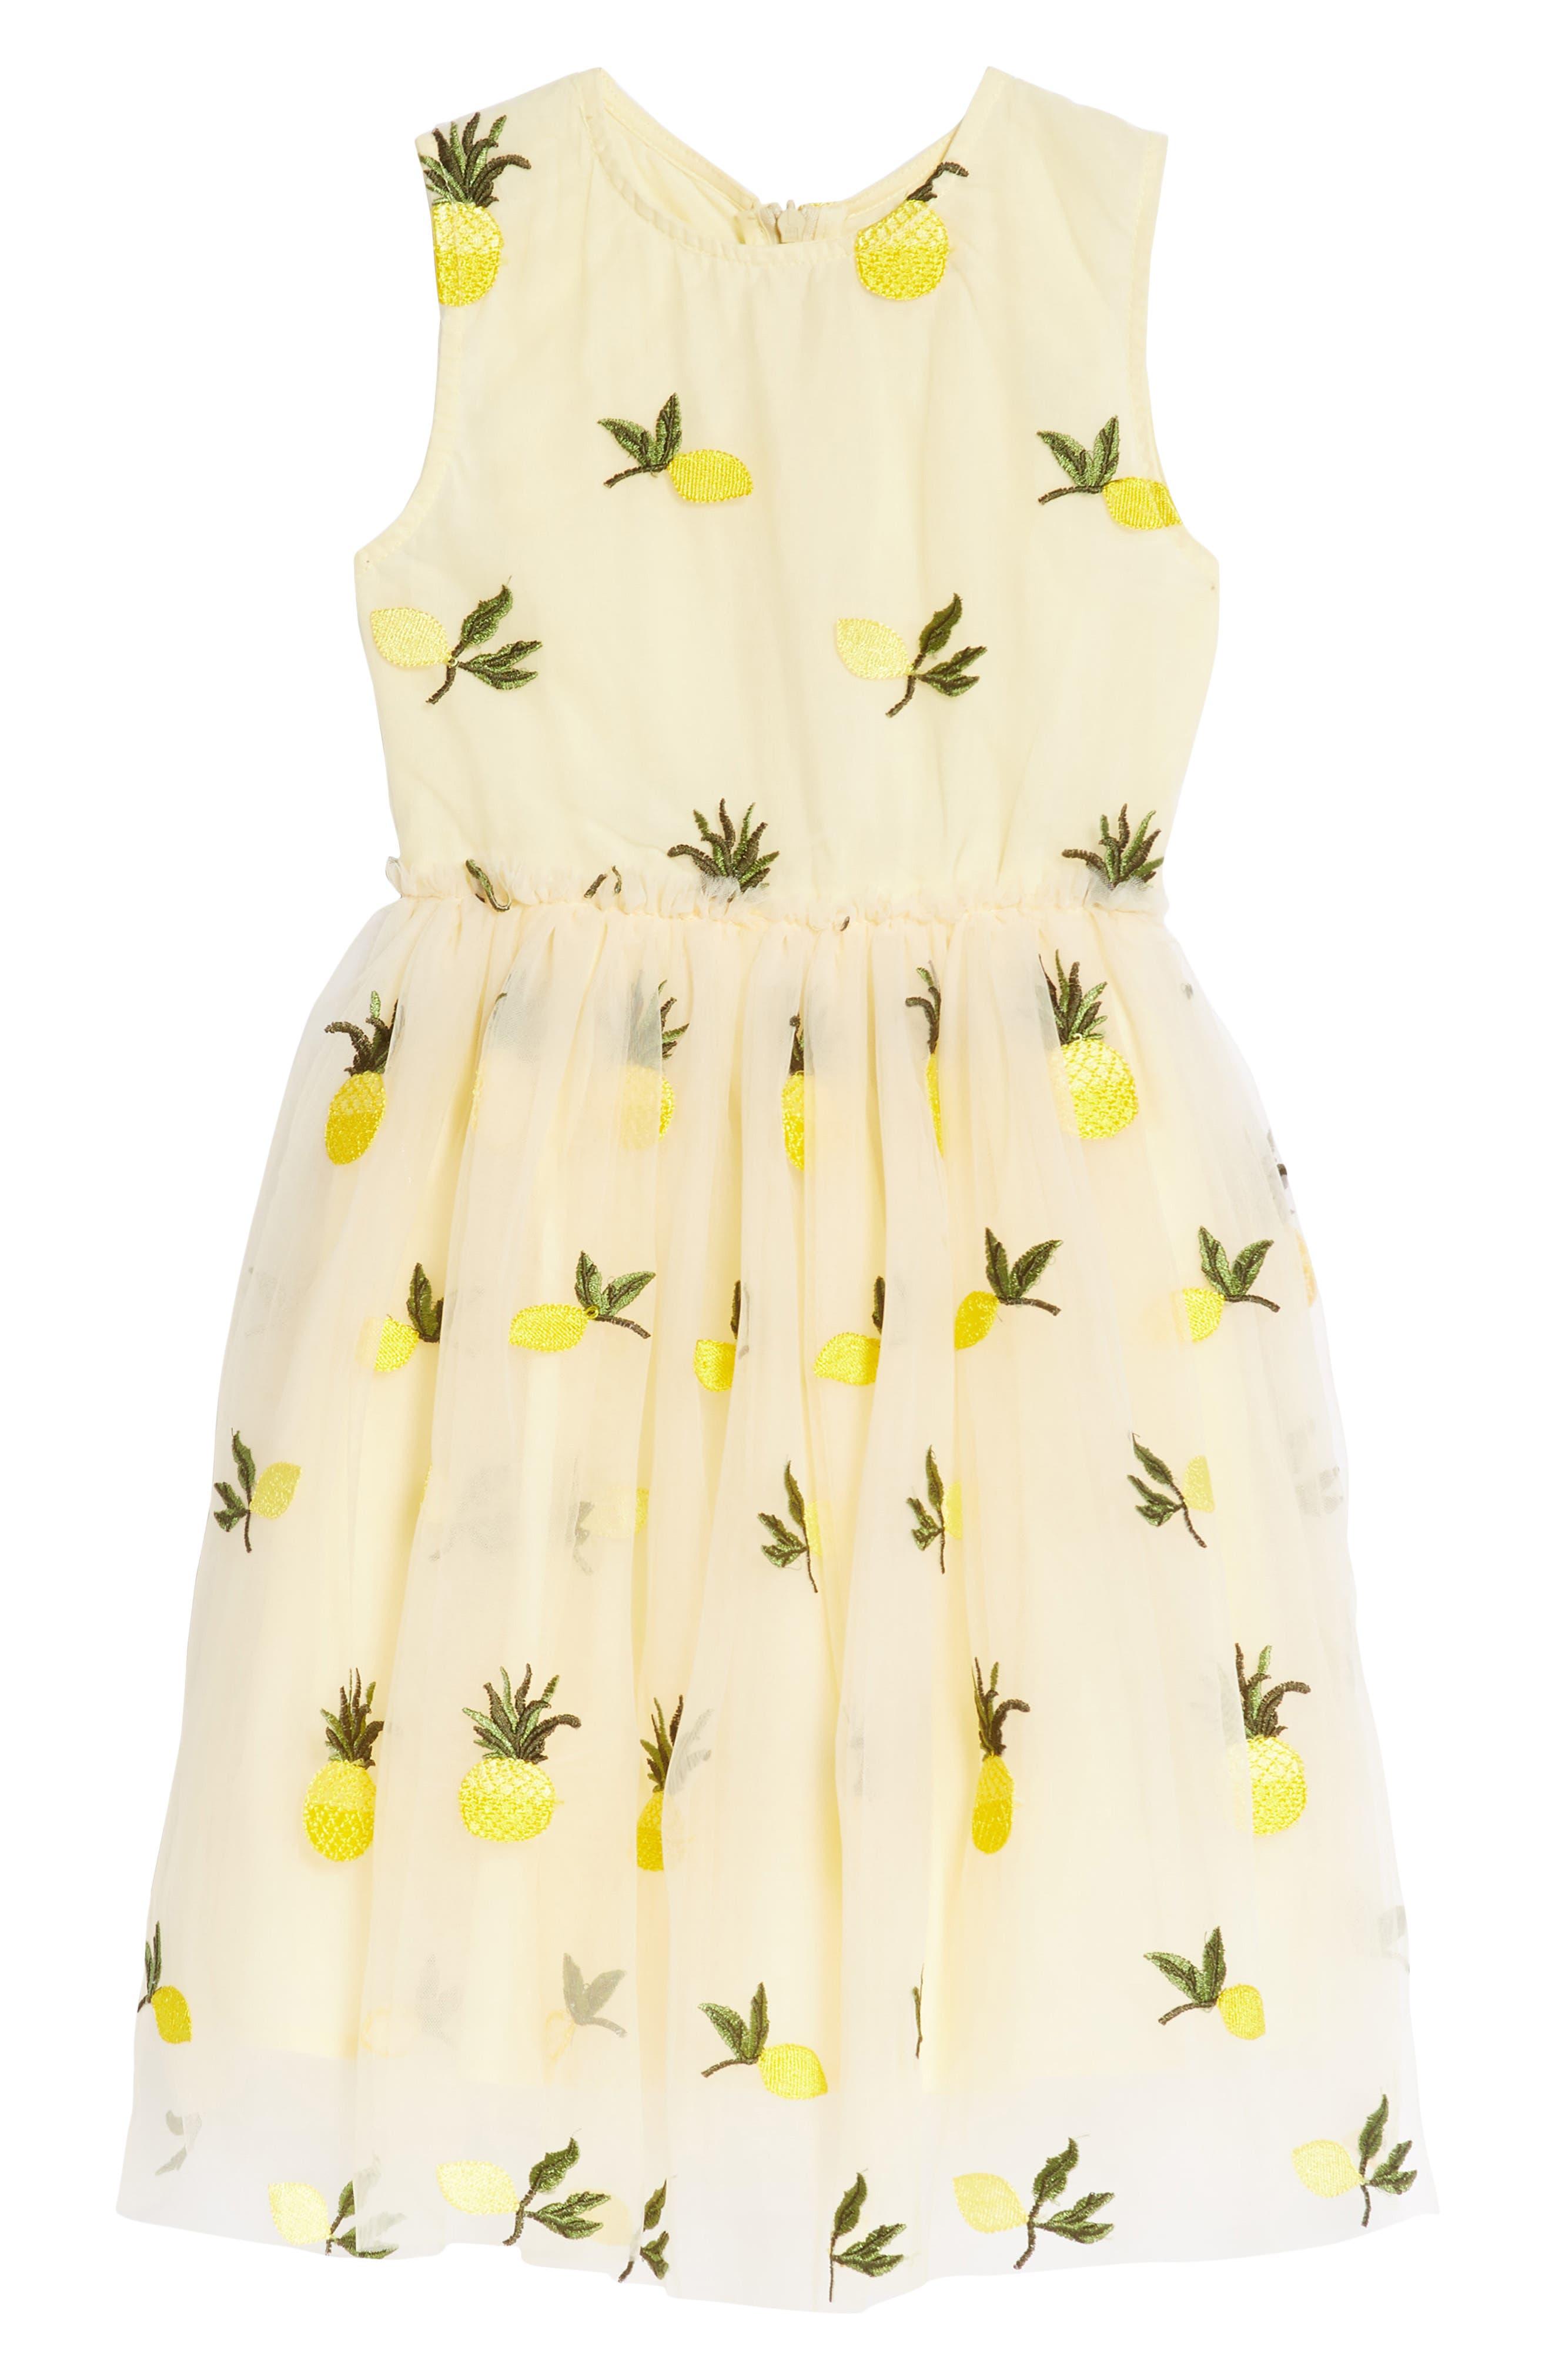 Pineapple & Lemon Embroidered Dress,                             Main thumbnail 1, color,                             Tan